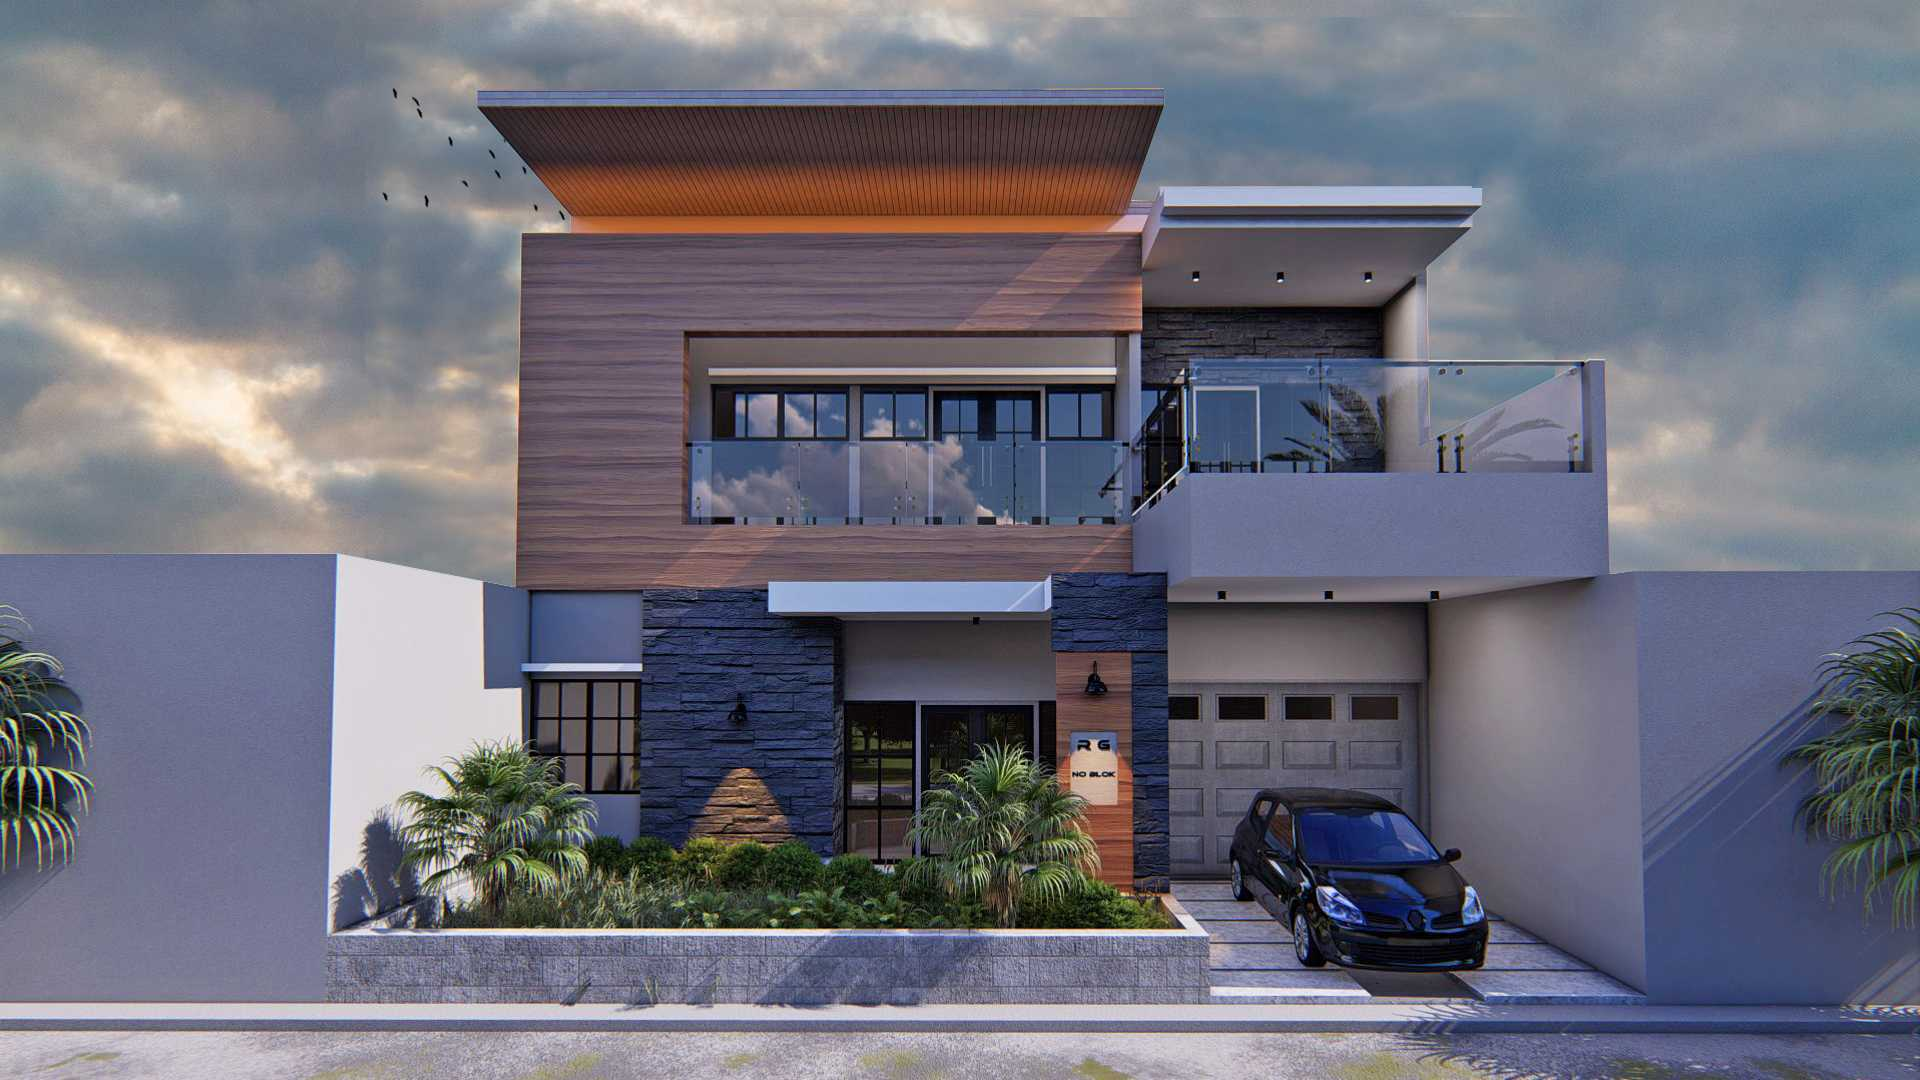 Jasa Arsitek Rchitect di Jambi